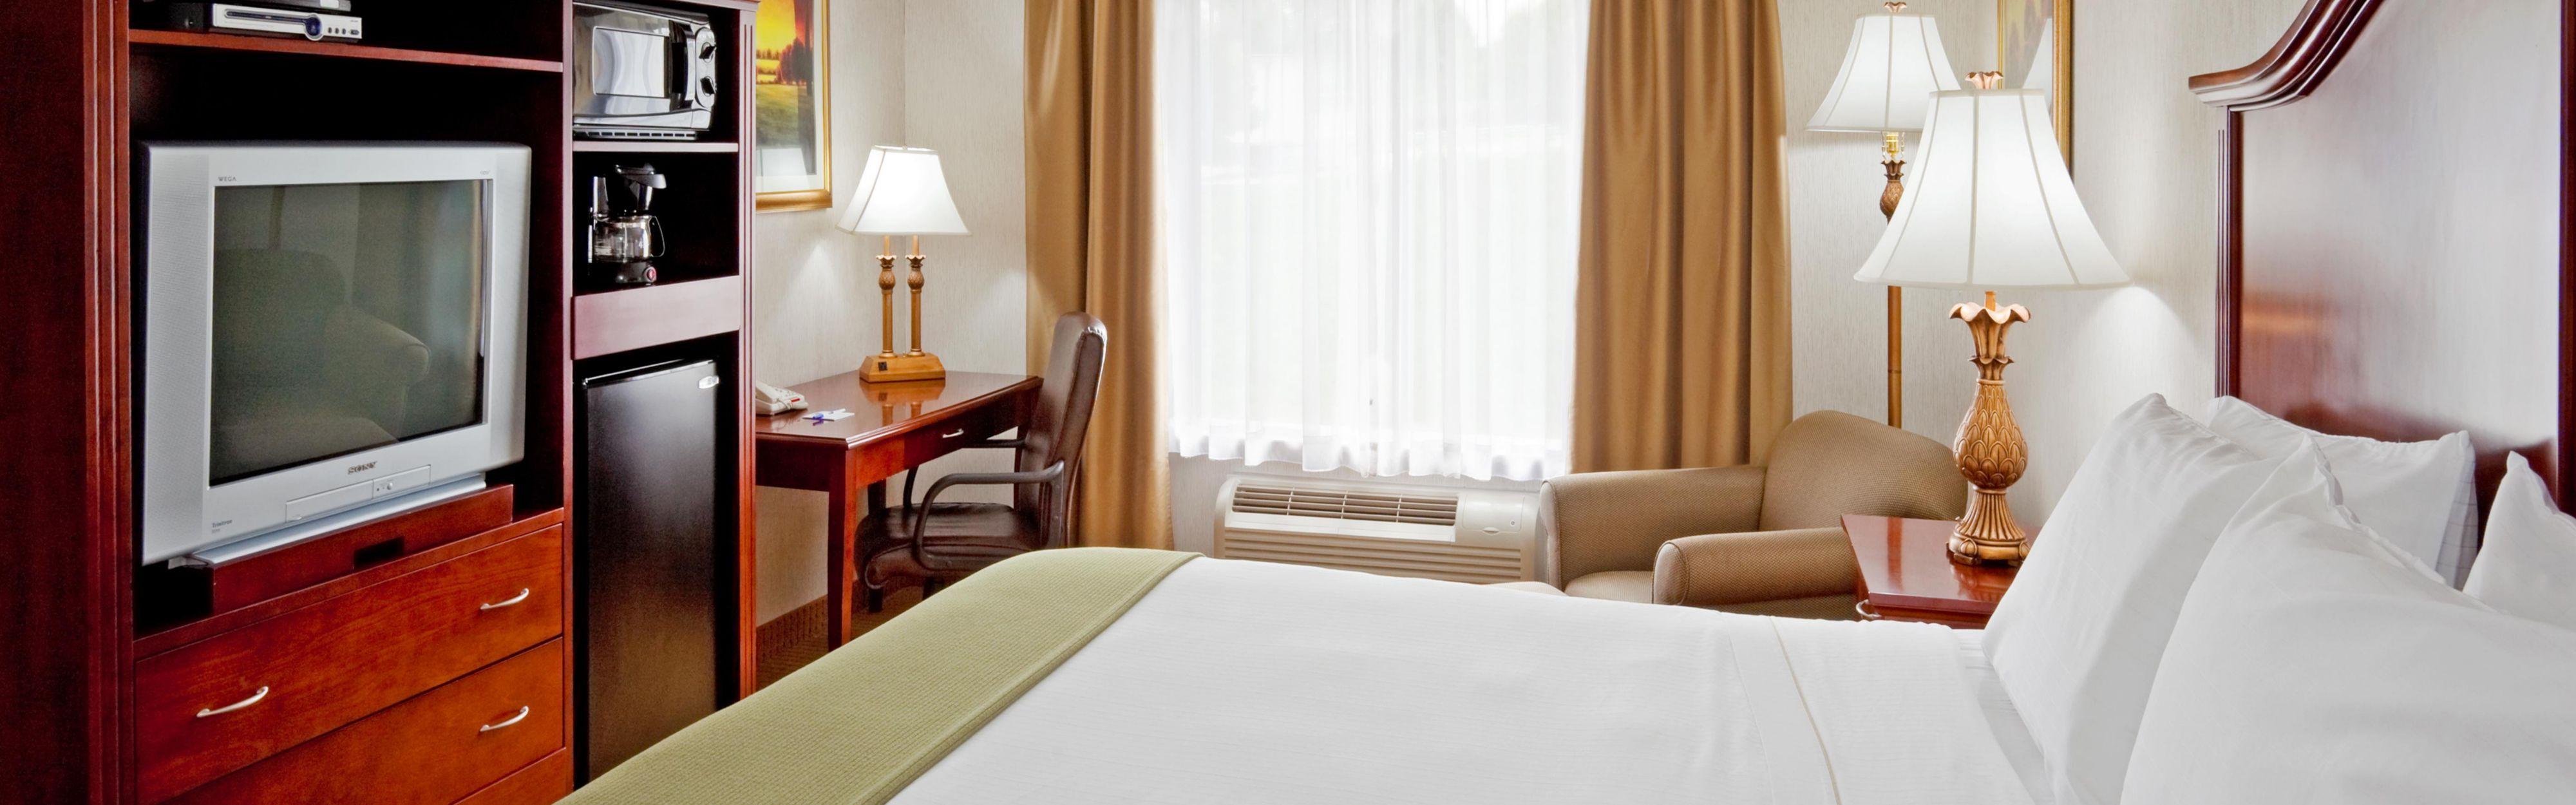 Holiday Inn Express & Suites Newton Sparta image 1